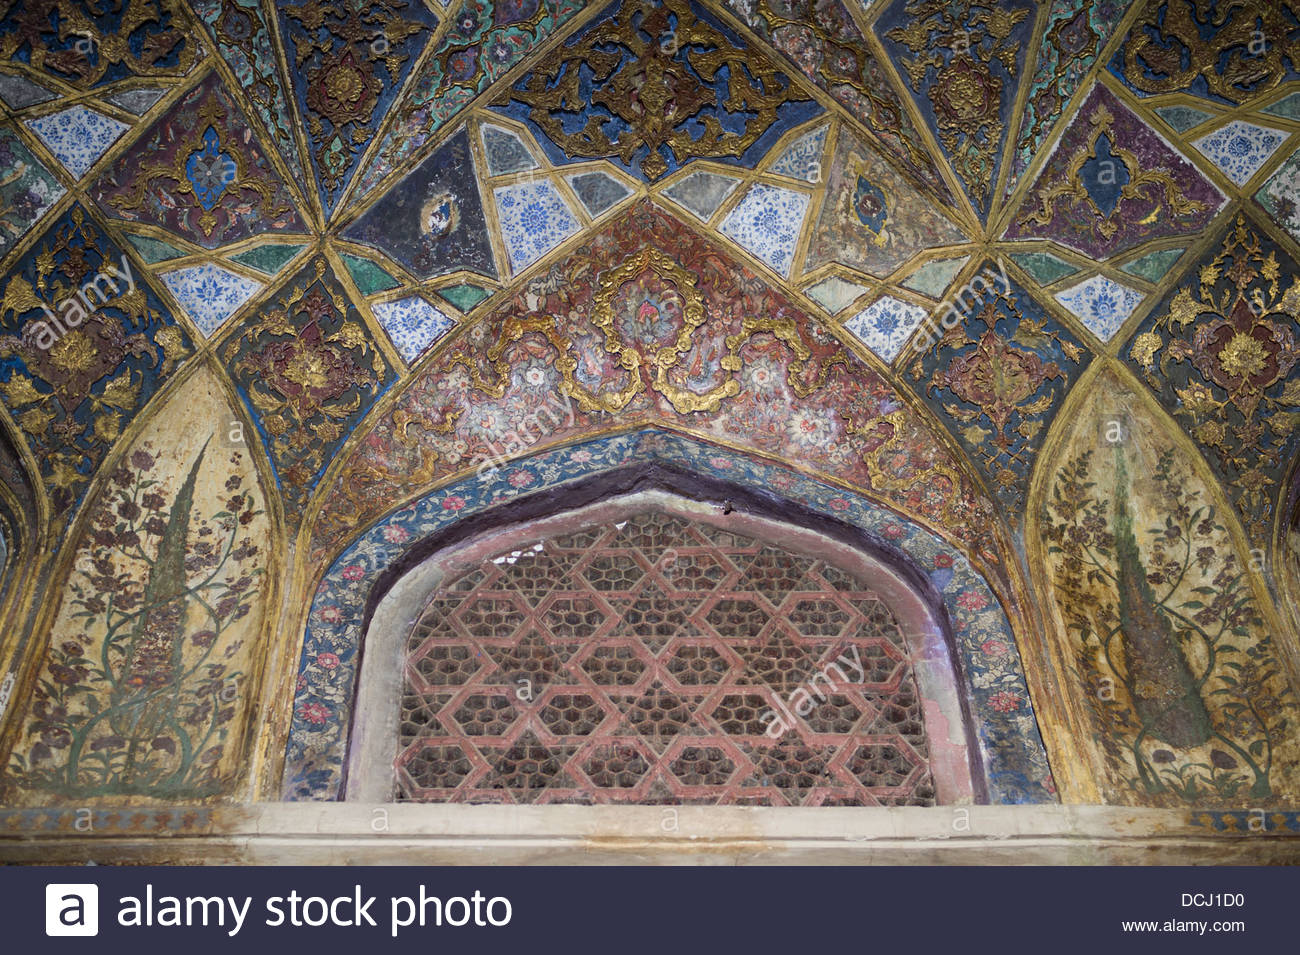 Itimad-ud-Daulah Tomb interior ( Baby Taj ) showing inlay ...